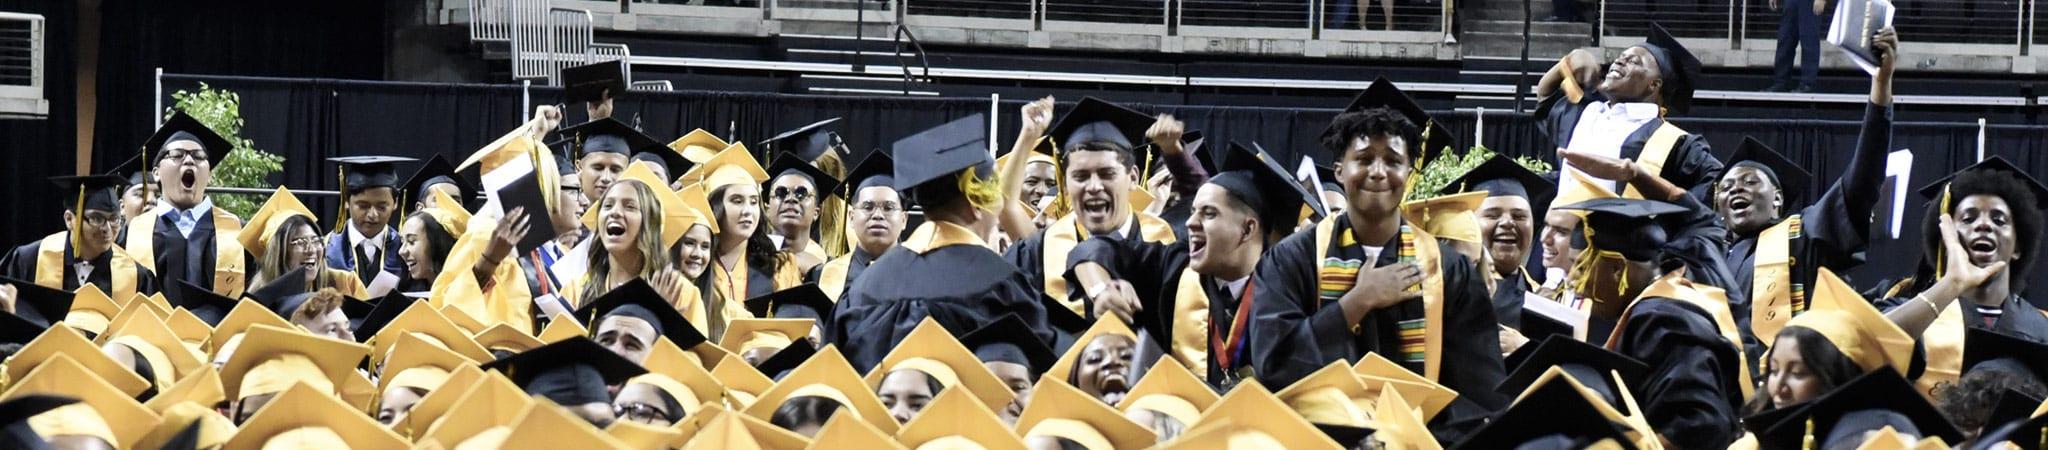 Edison graduates celebrating